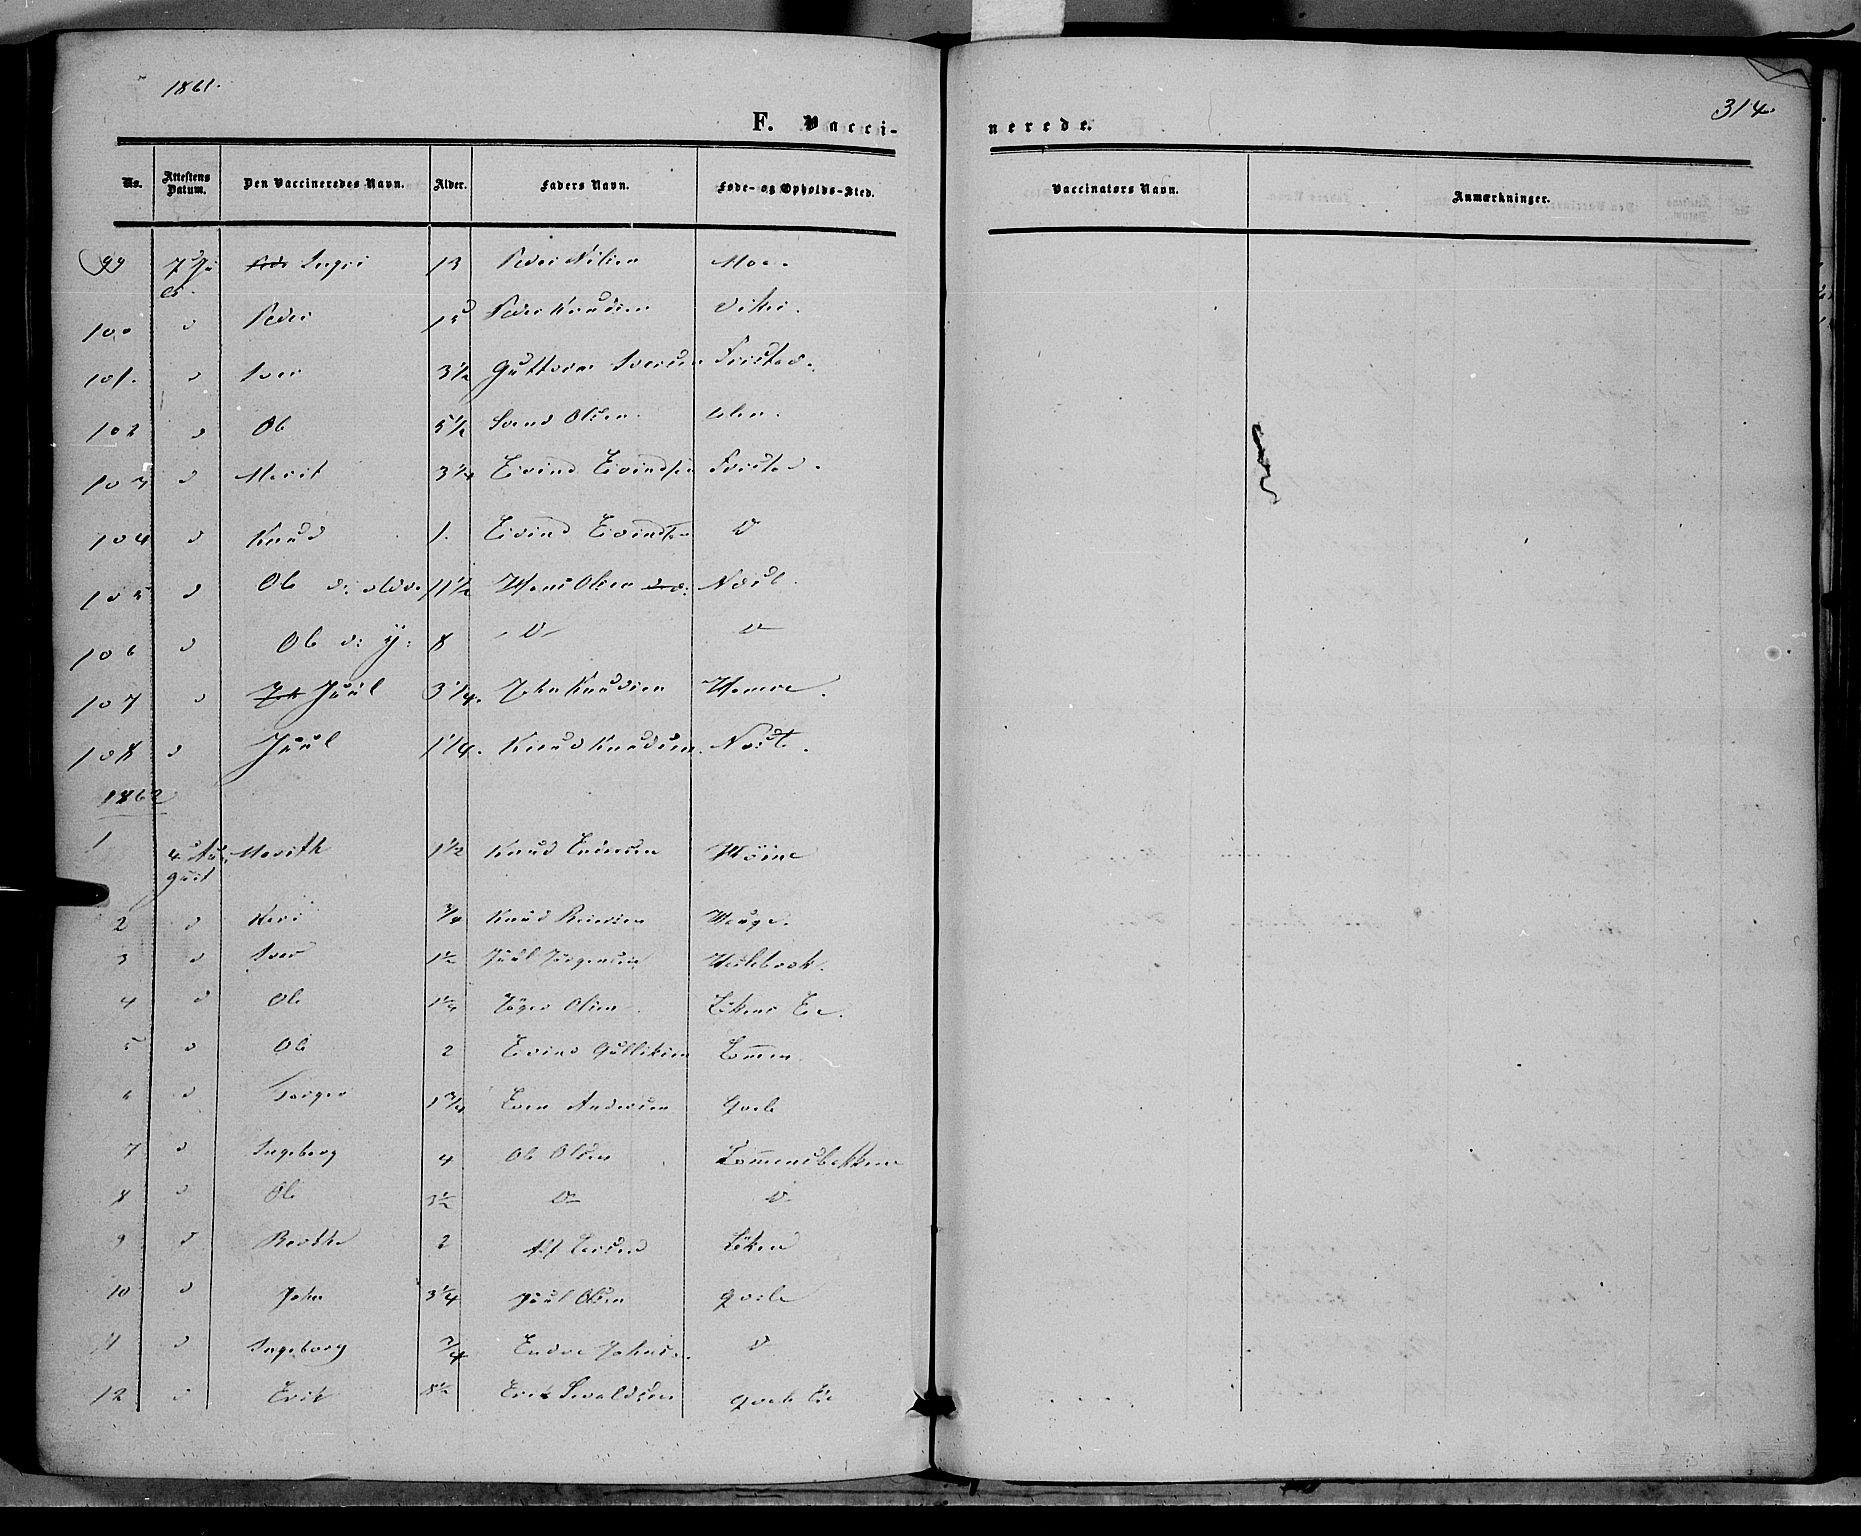 SAH, Vestre Slidre prestekontor, Ministerialbok nr. 2, 1856-1864, s. 314